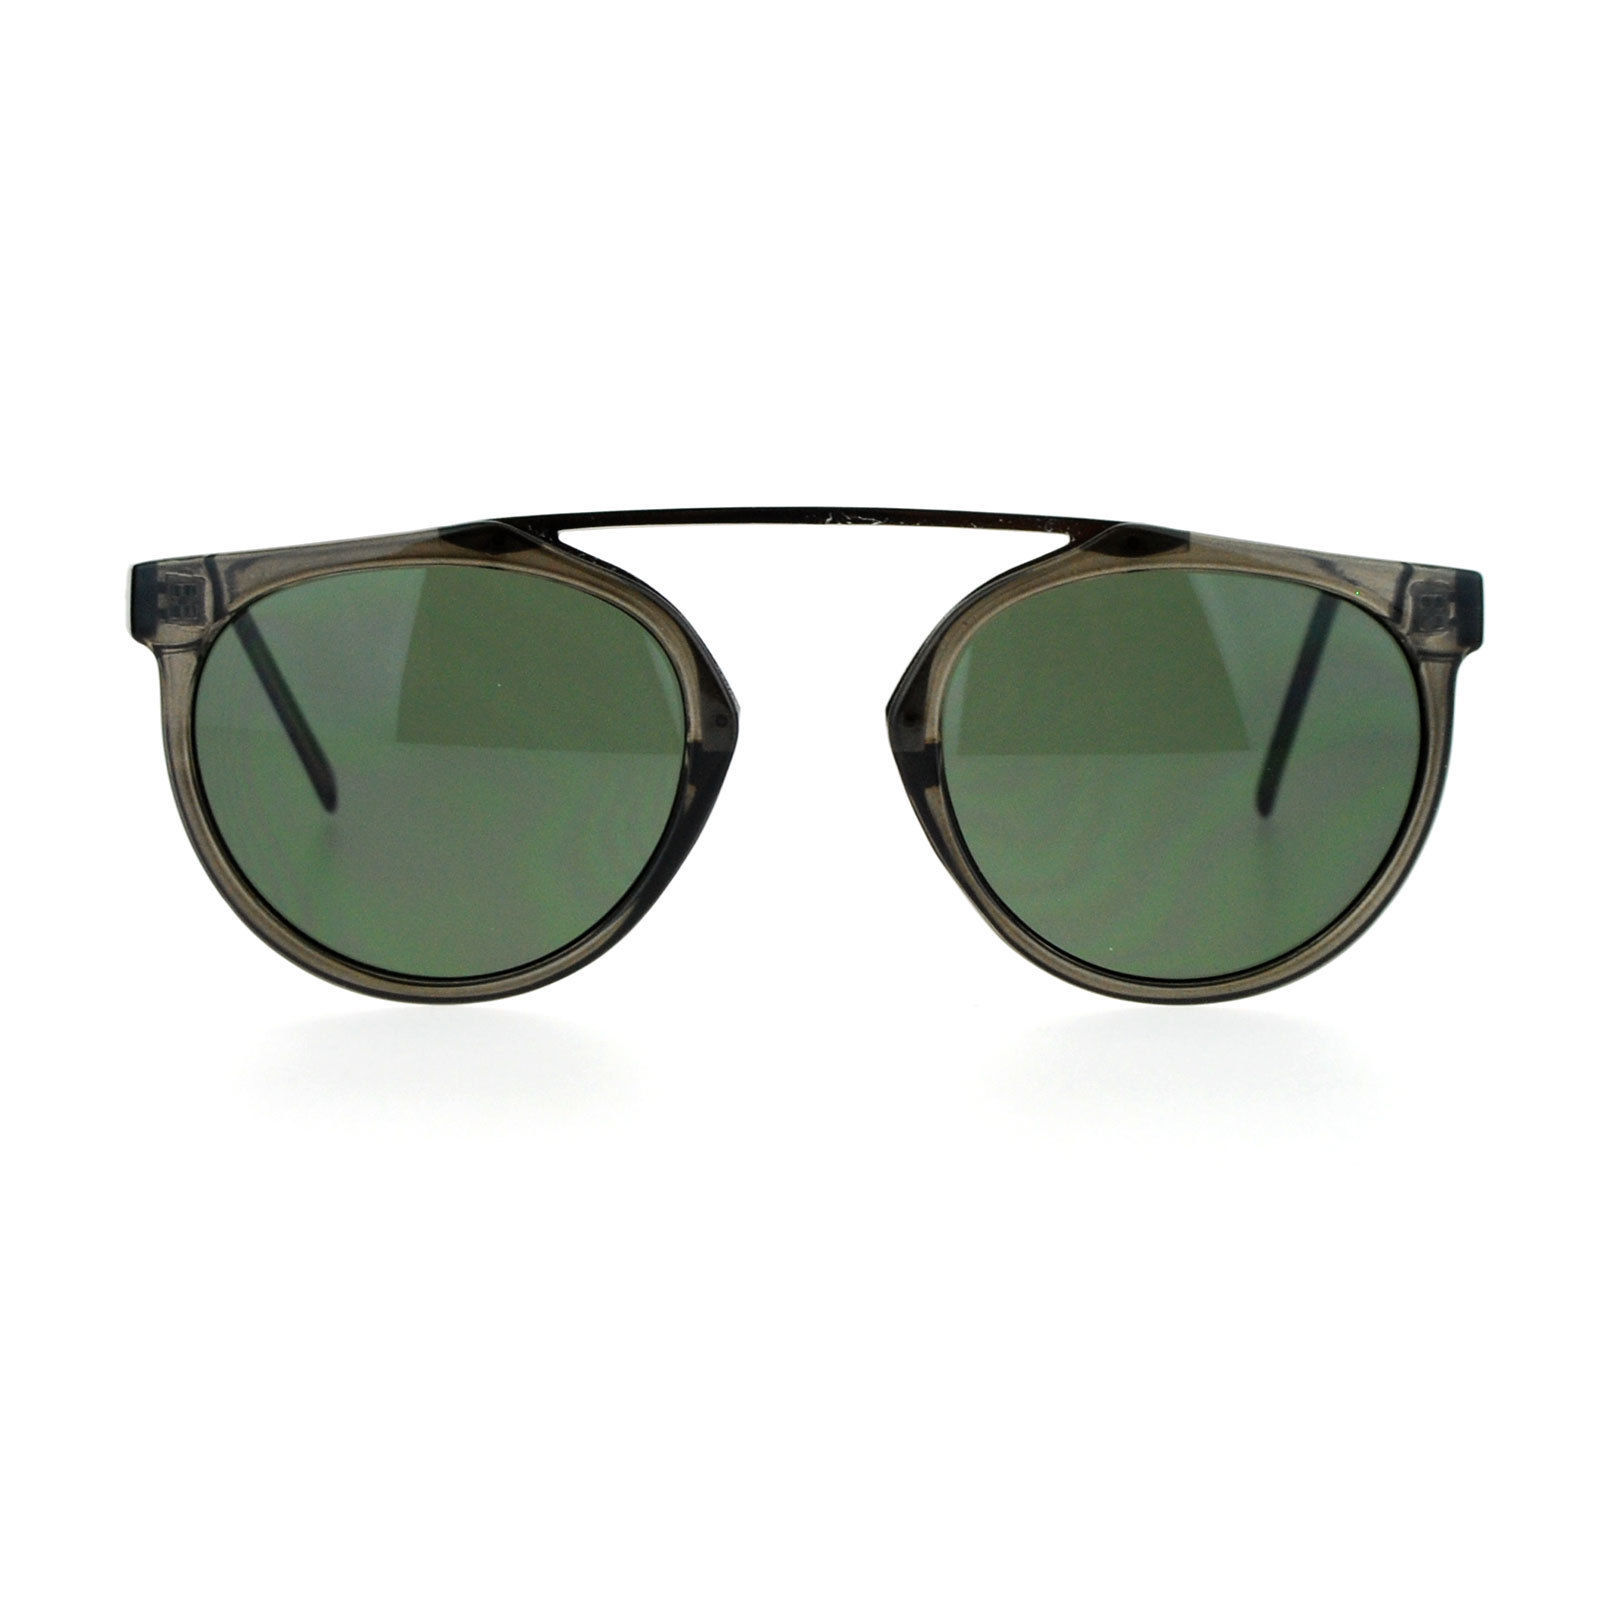 Arched Bridge Top Round Aviator Sunglasses Unique Unisex Fashion Shades